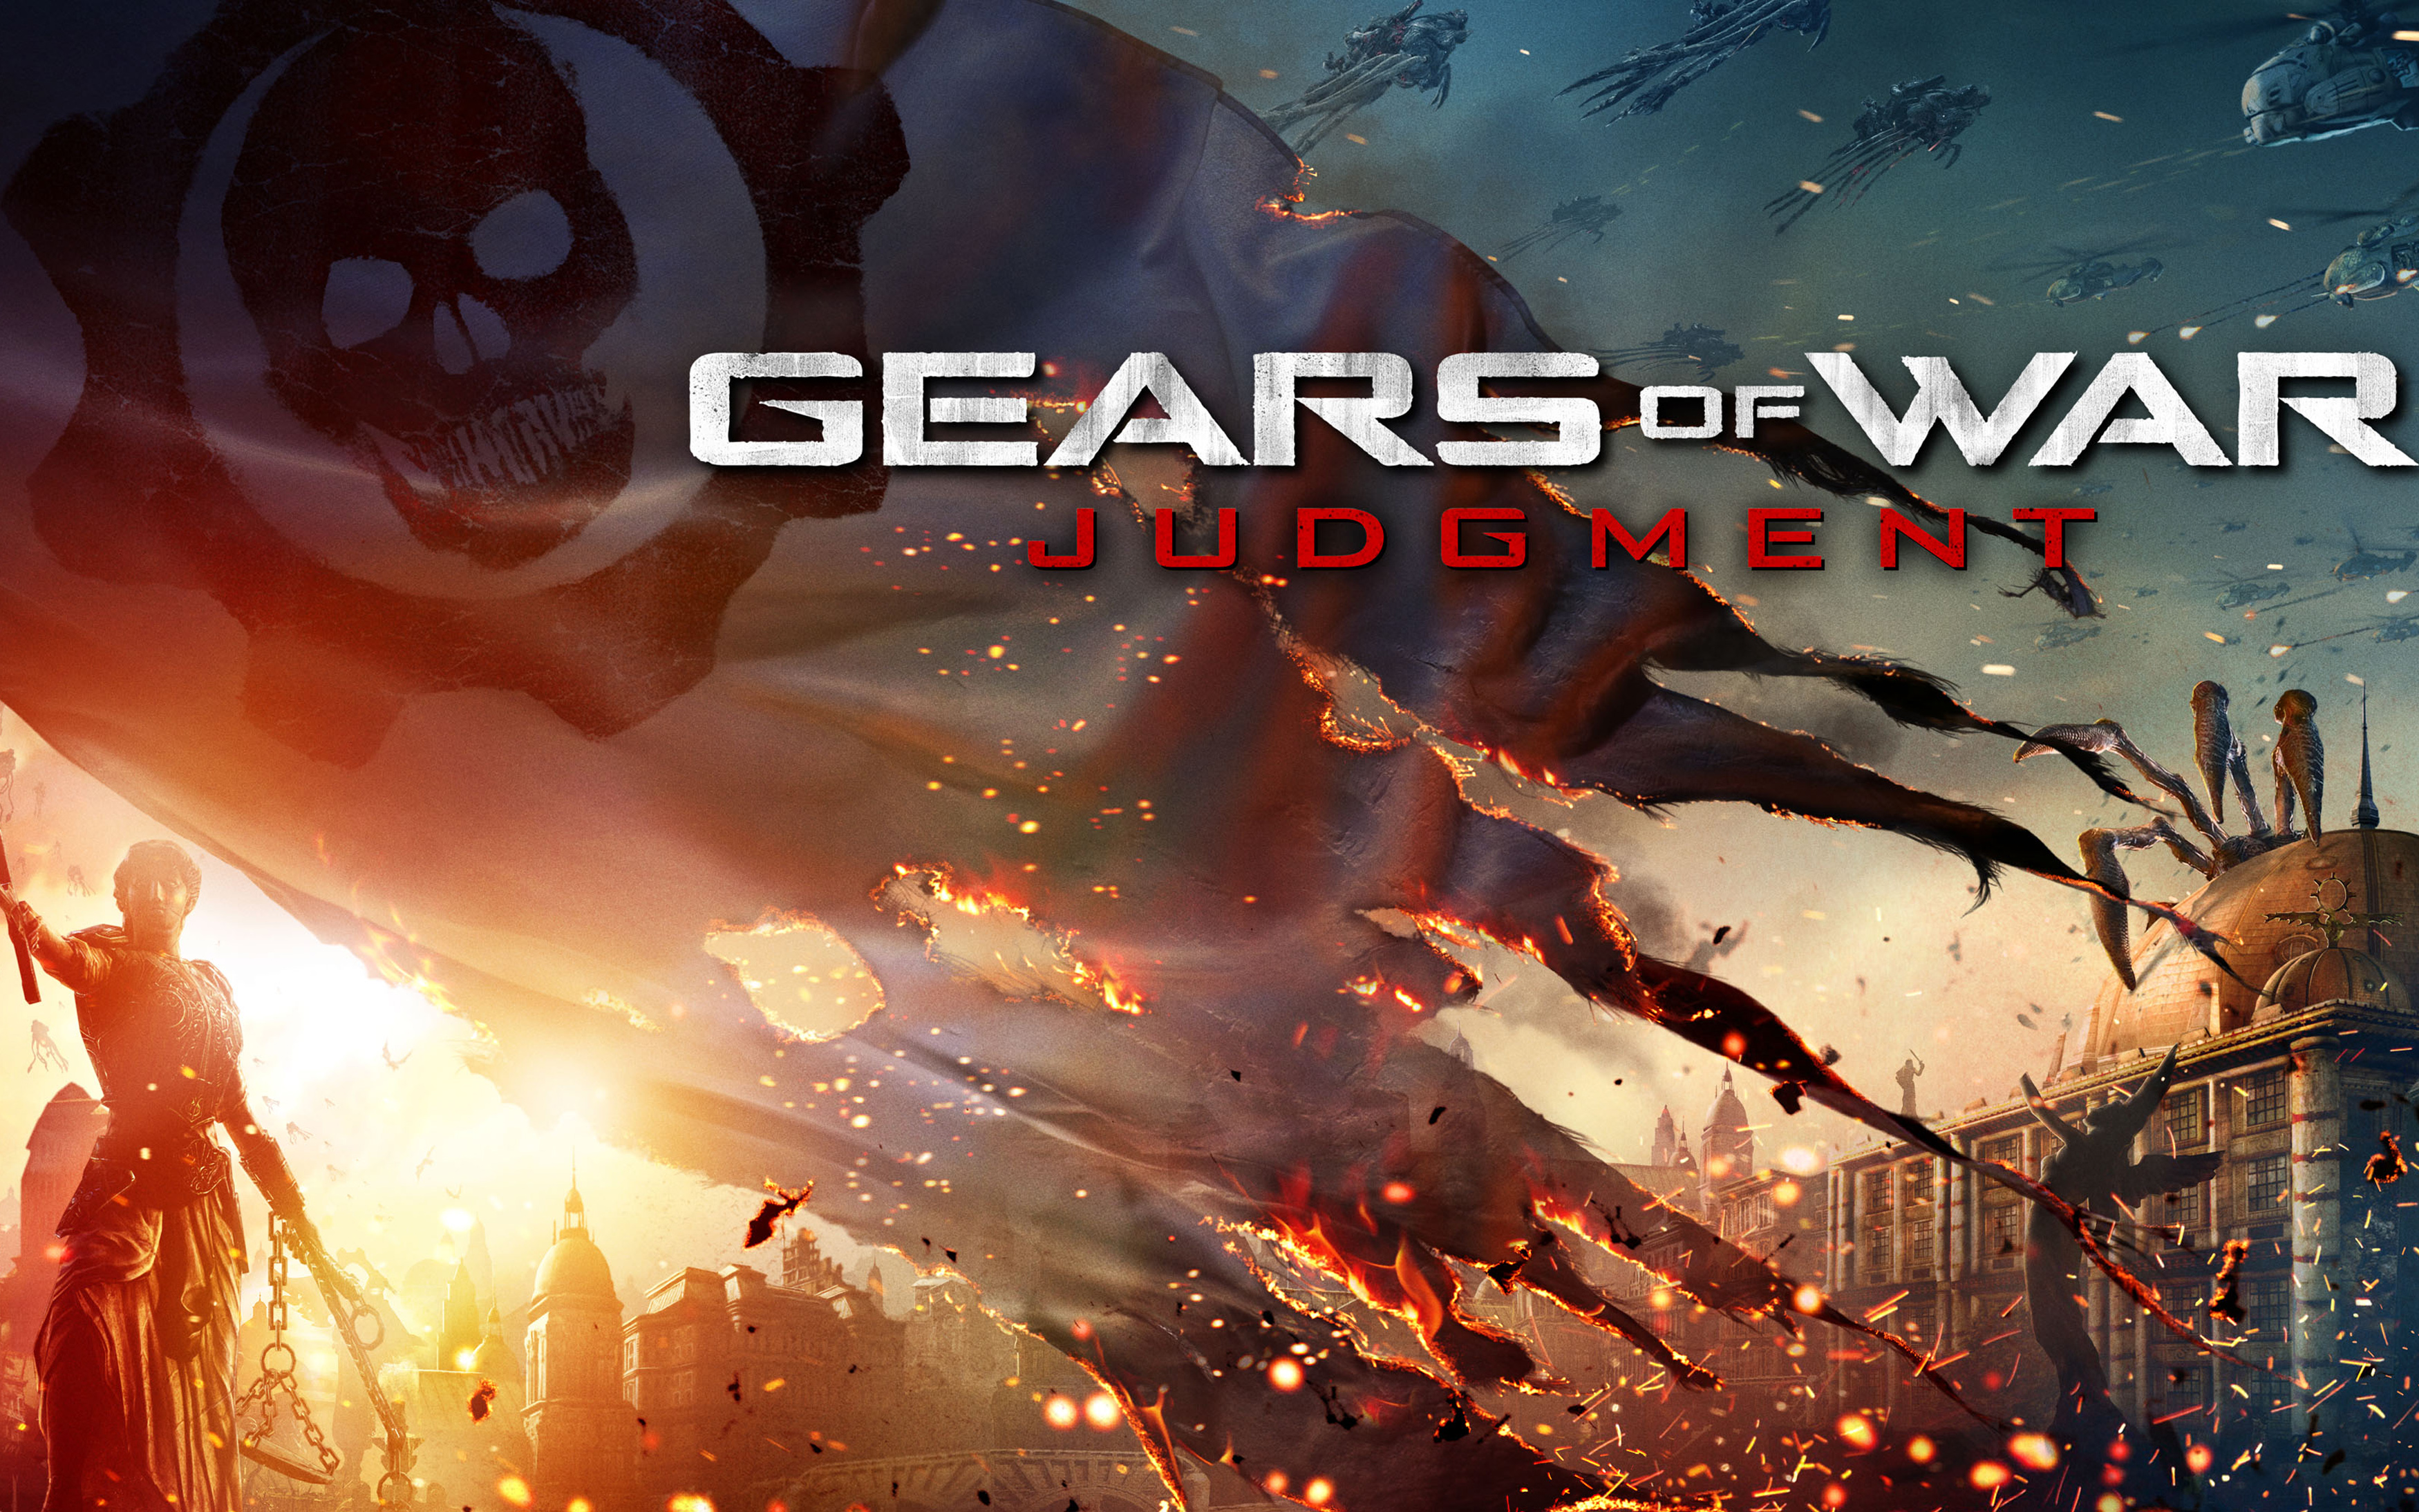 Gears of War Judgment Wallpapers HD Wallpapers 3500x2188